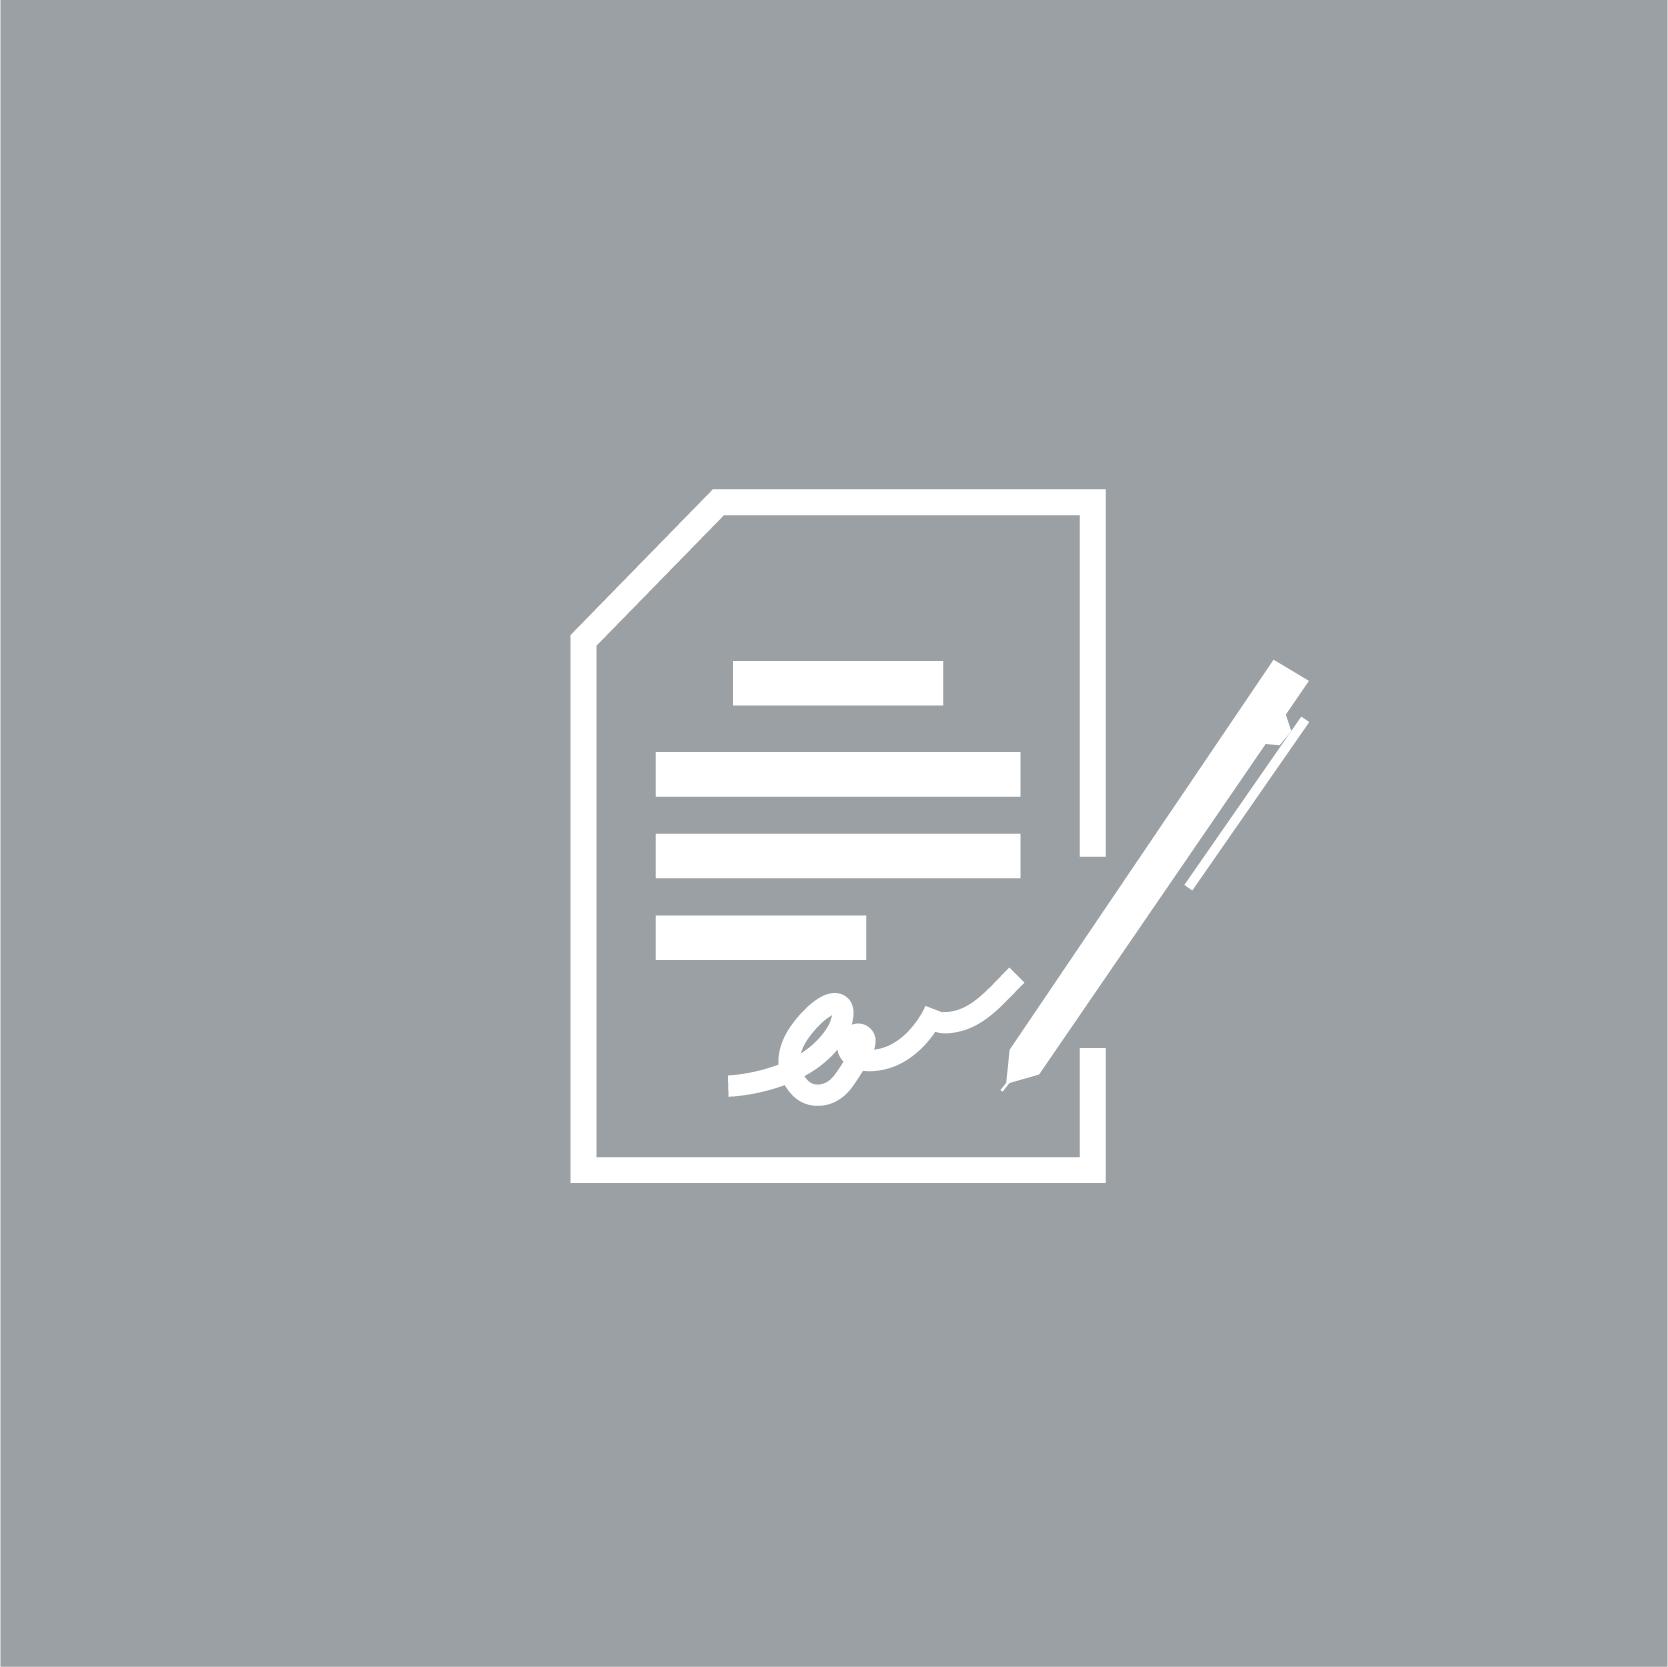 Manage Post Ratification -